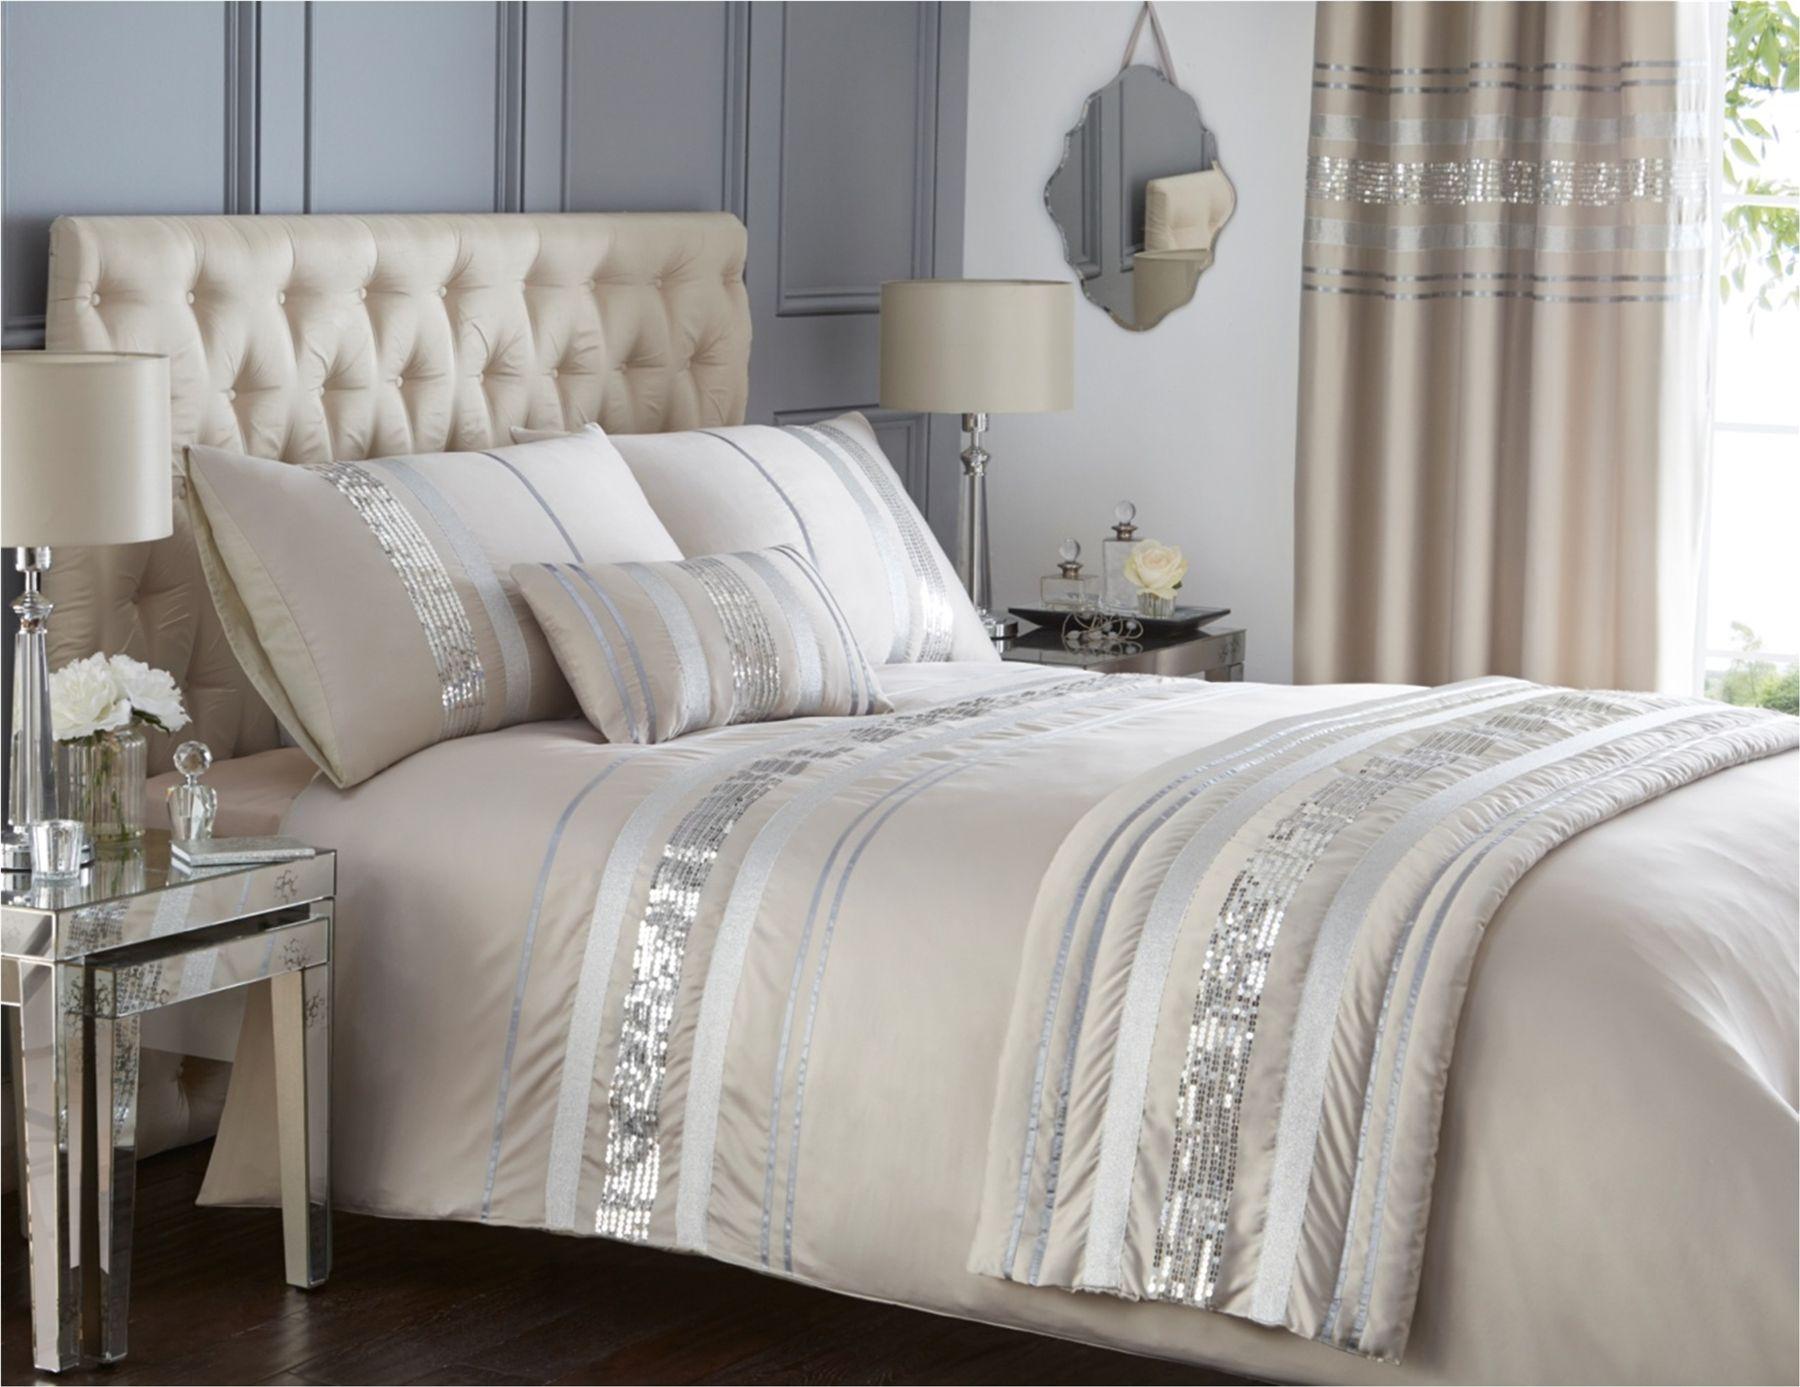 modern sequin quilt duvet cover   pillowcase bedding bed set  - modernsequinquiltduvetcoveramppillowcase